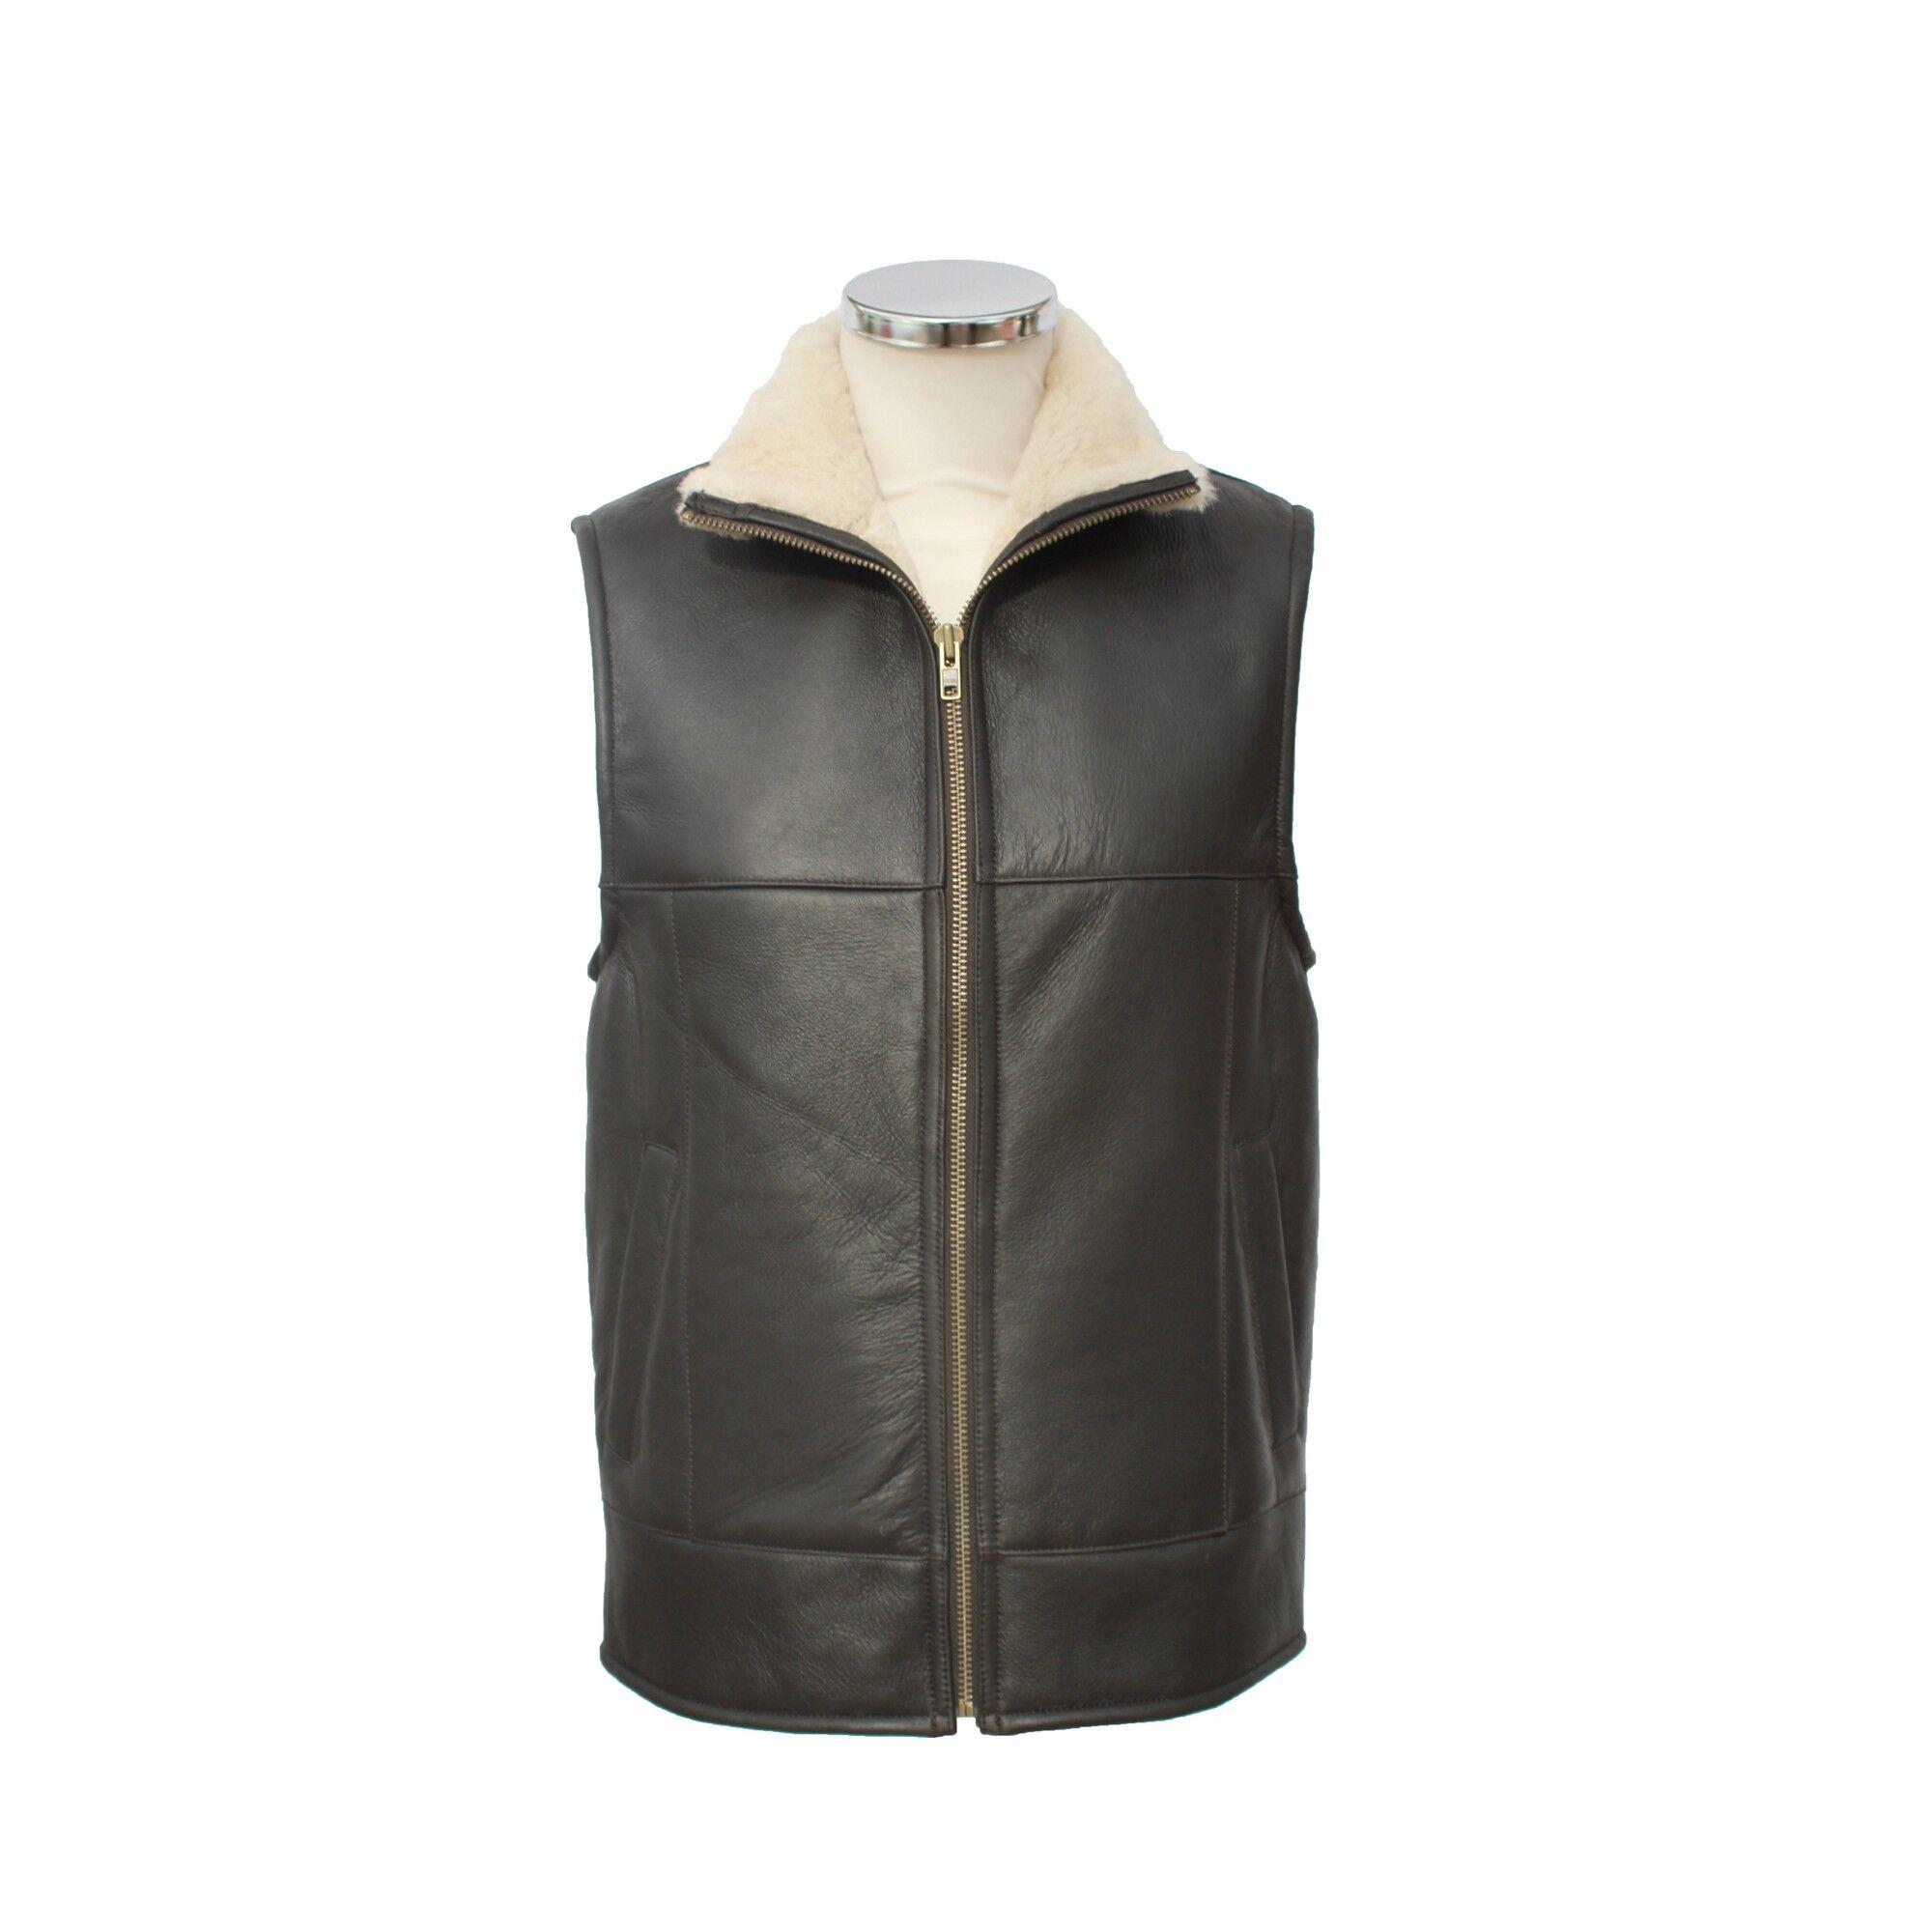 Eastern Counties Leather - Gilet Sans Manches Harvey - Homme (Marron foncé) - UTEL188